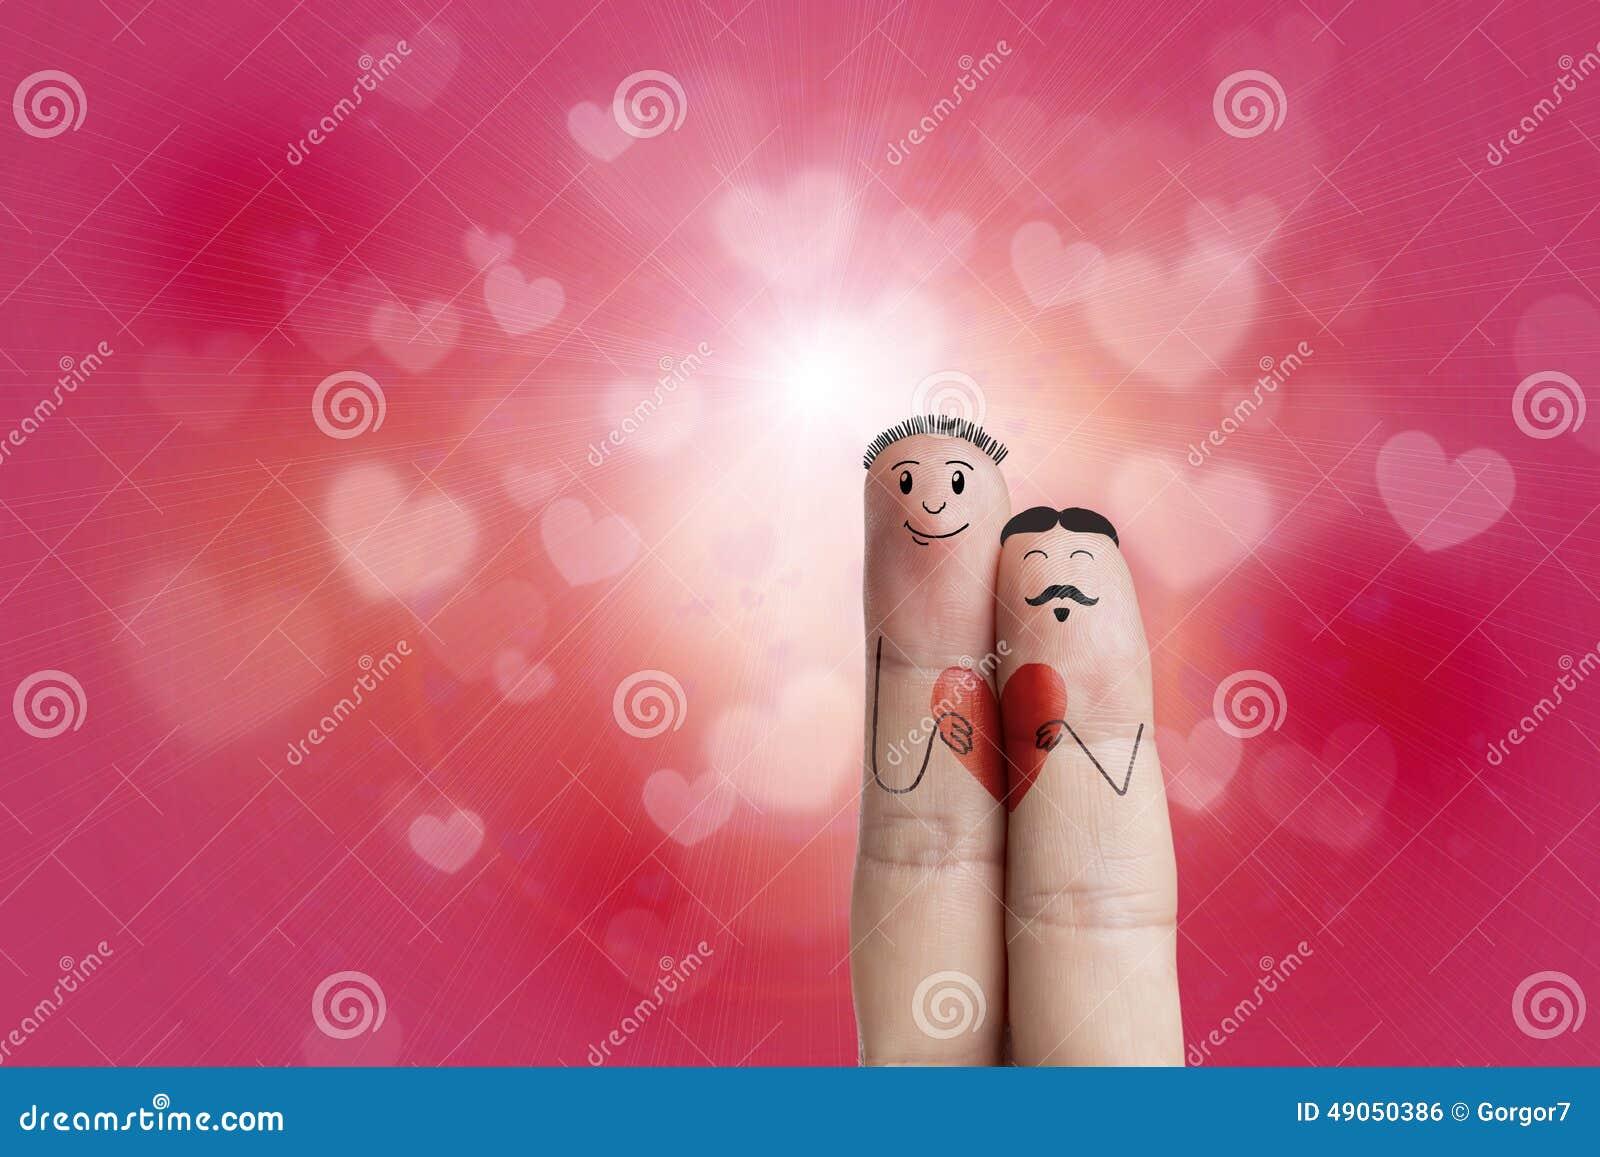 GOOGLE VALENTINE VIDEO GAY COUPLE